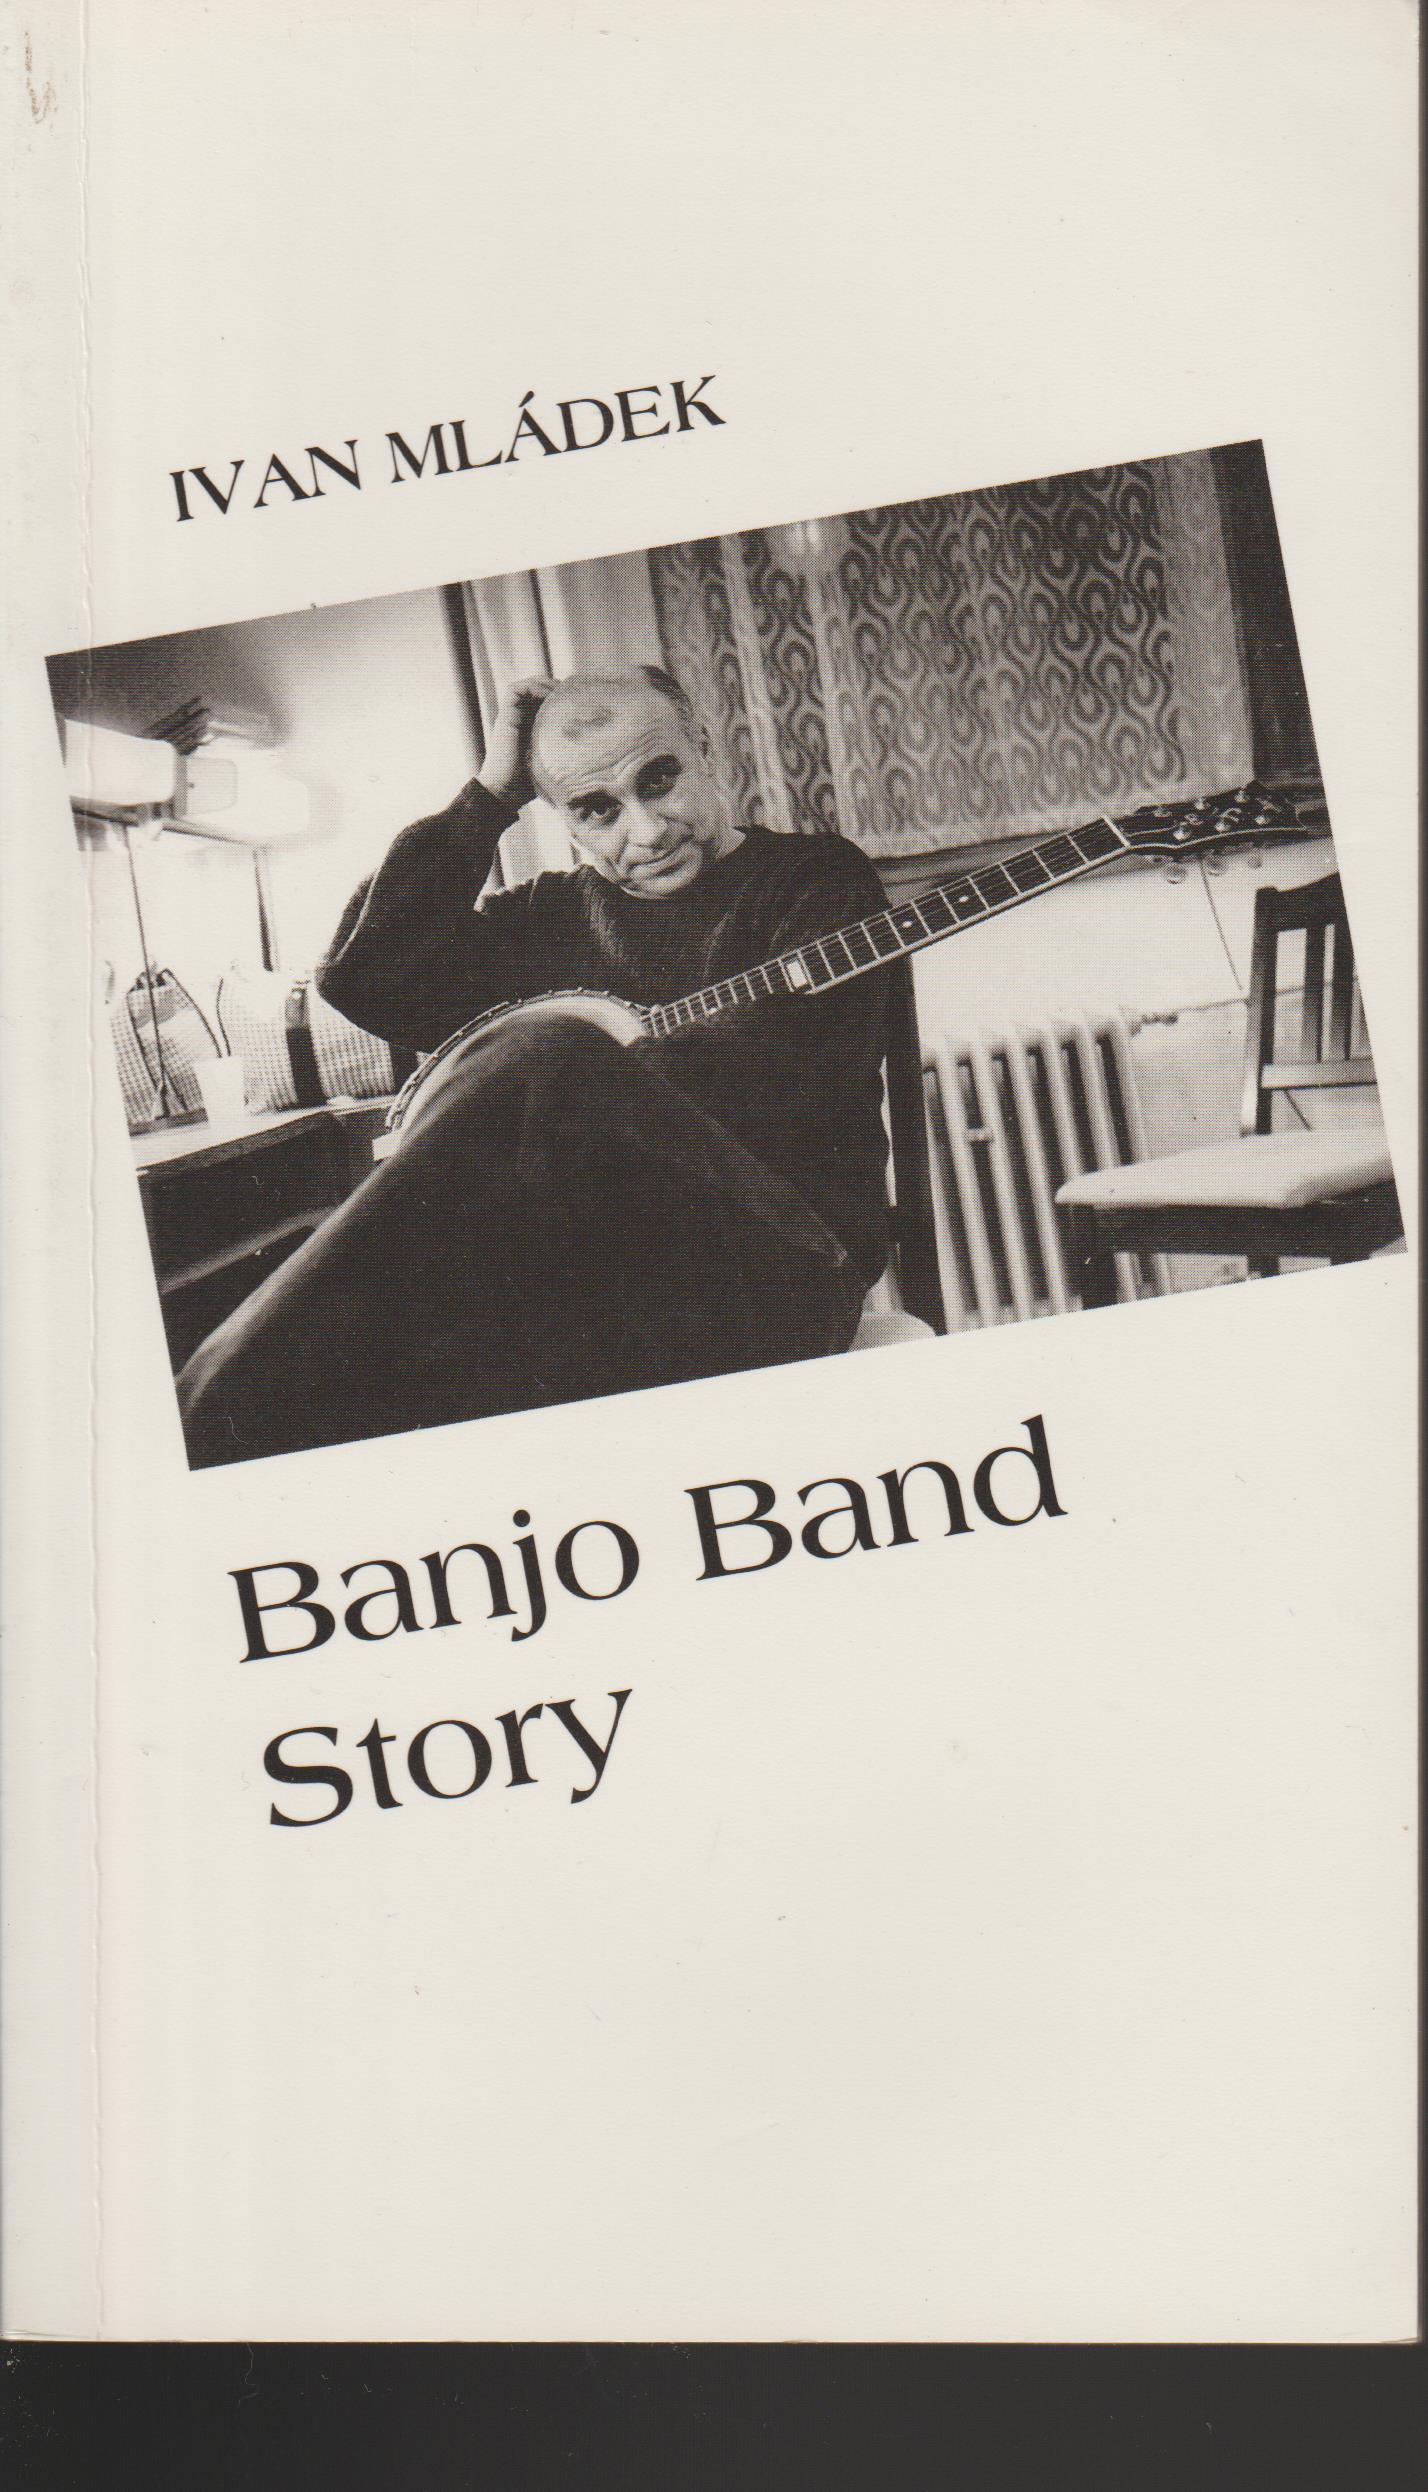 Banjo Band story - Ivan Mládek